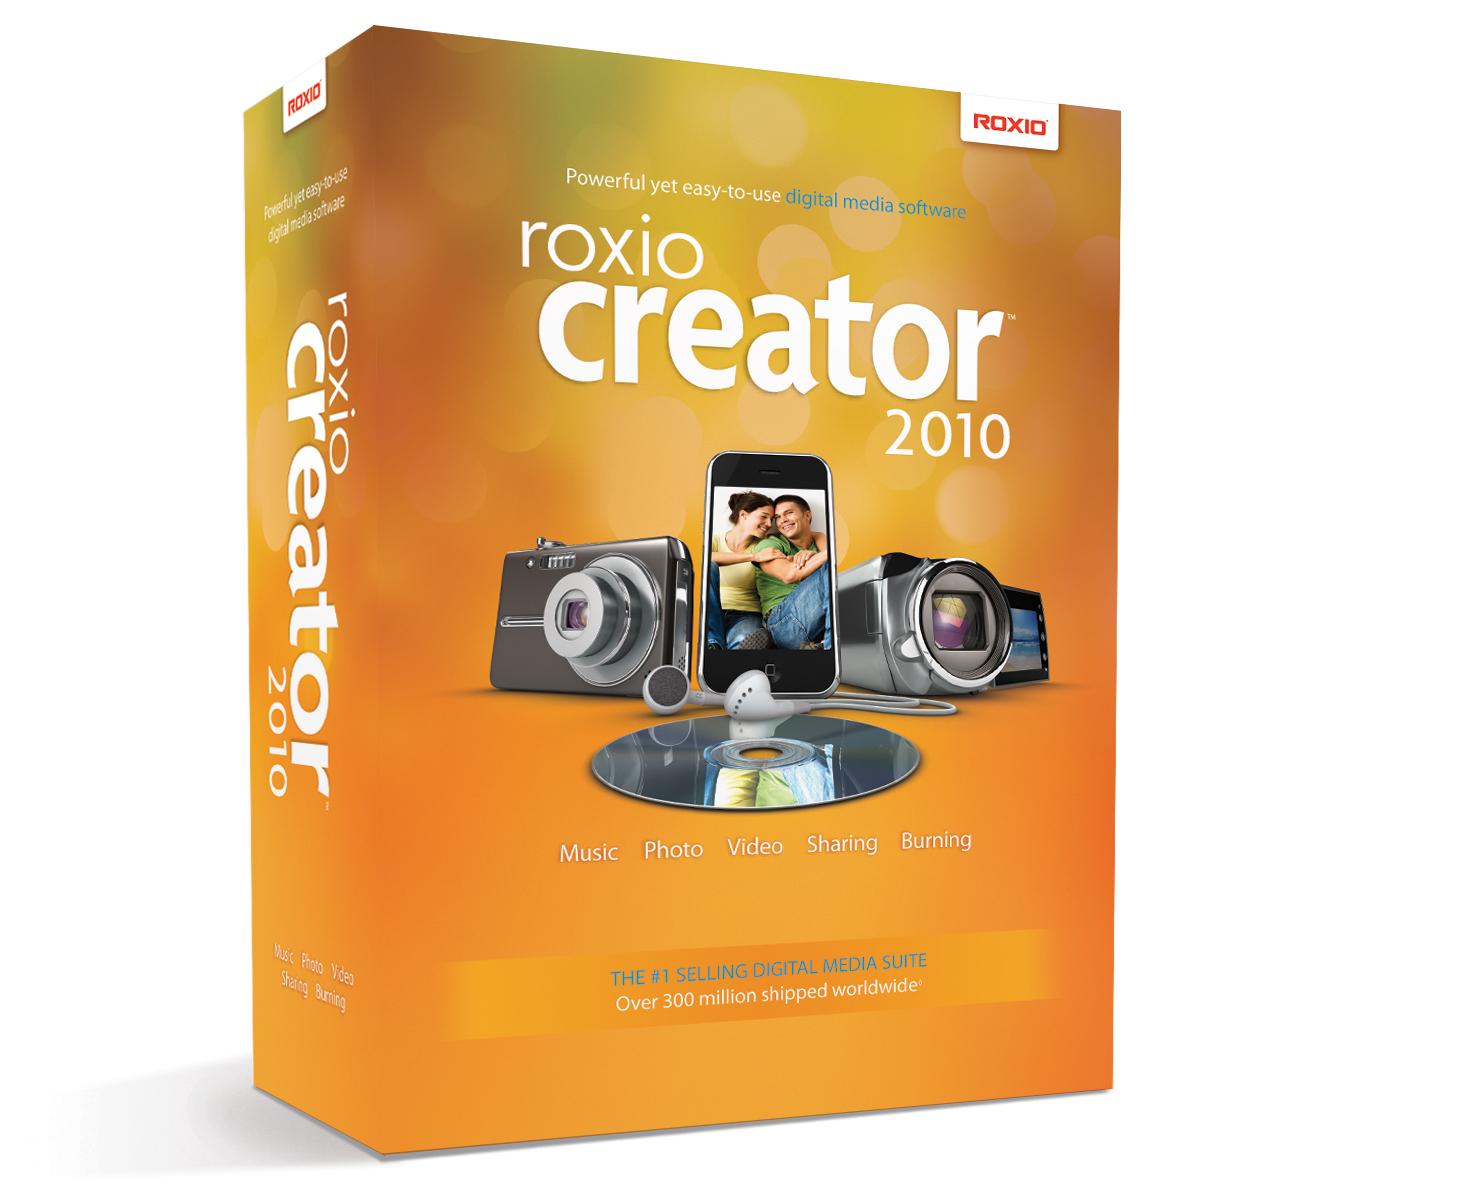 Roxio - New Roxio Creator 2010 Adds Breakthrough Video Enhancements